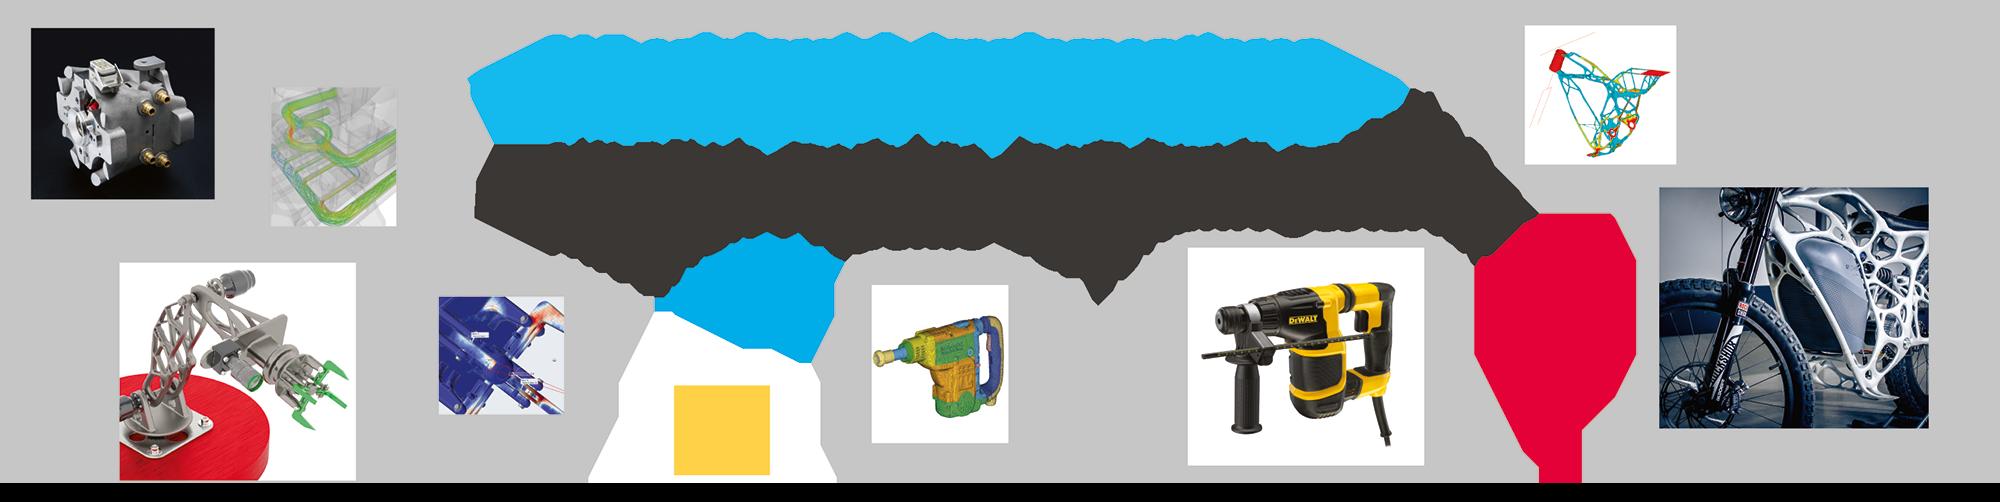 Header_Mailing_CAE_Implementation_Webinar_3